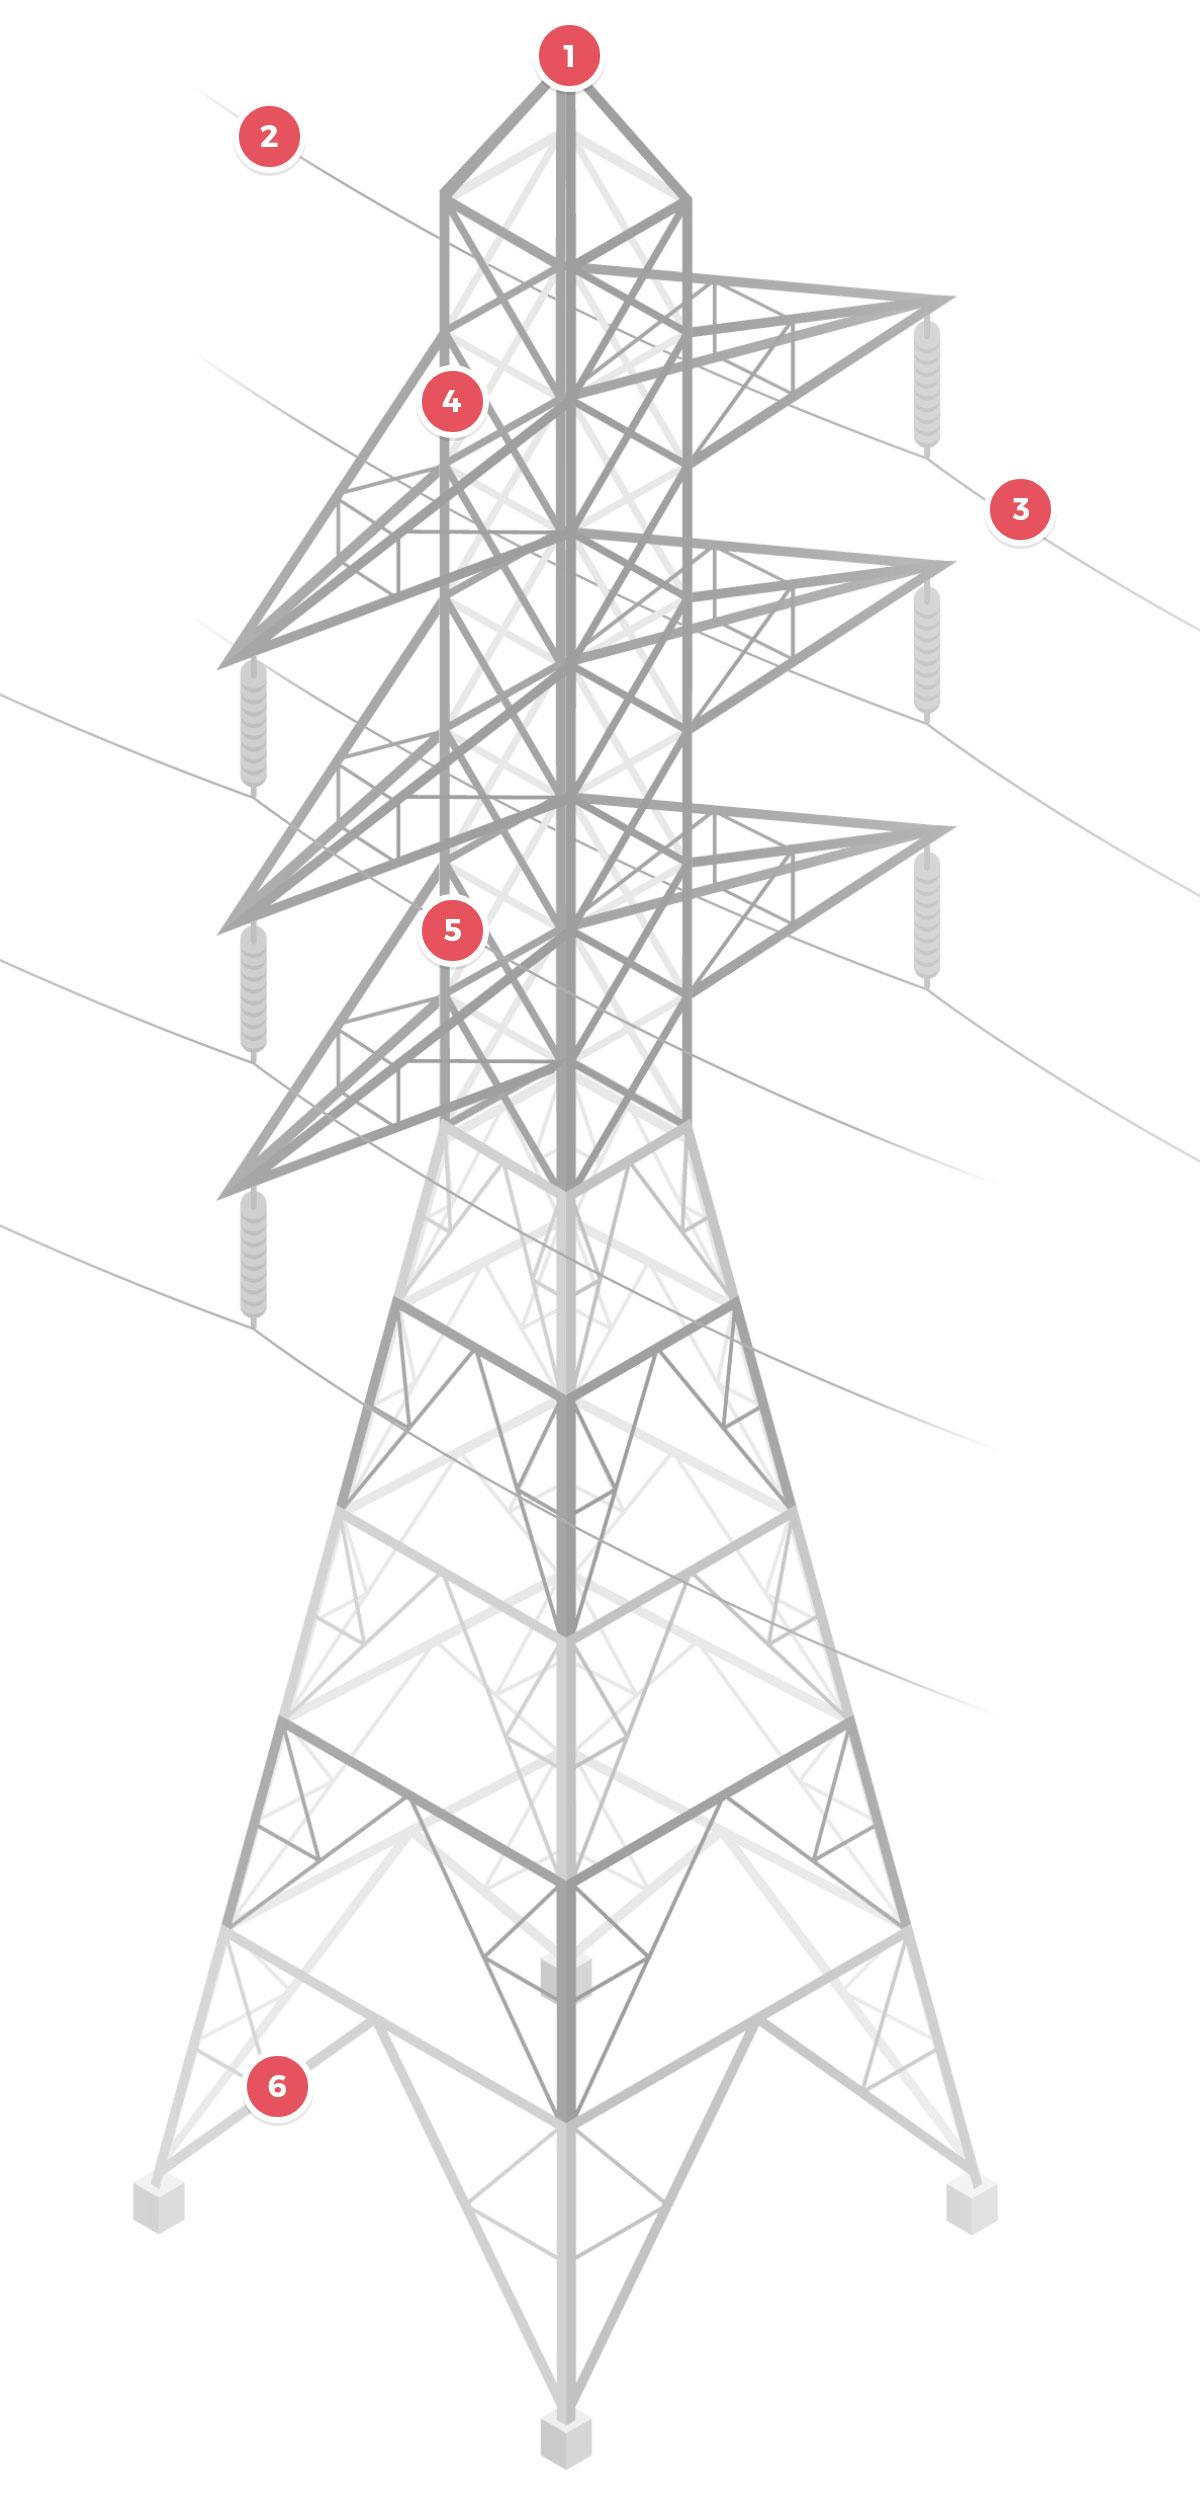 delta-box_applications_markings-for-high-voltage-line-schema-visuel